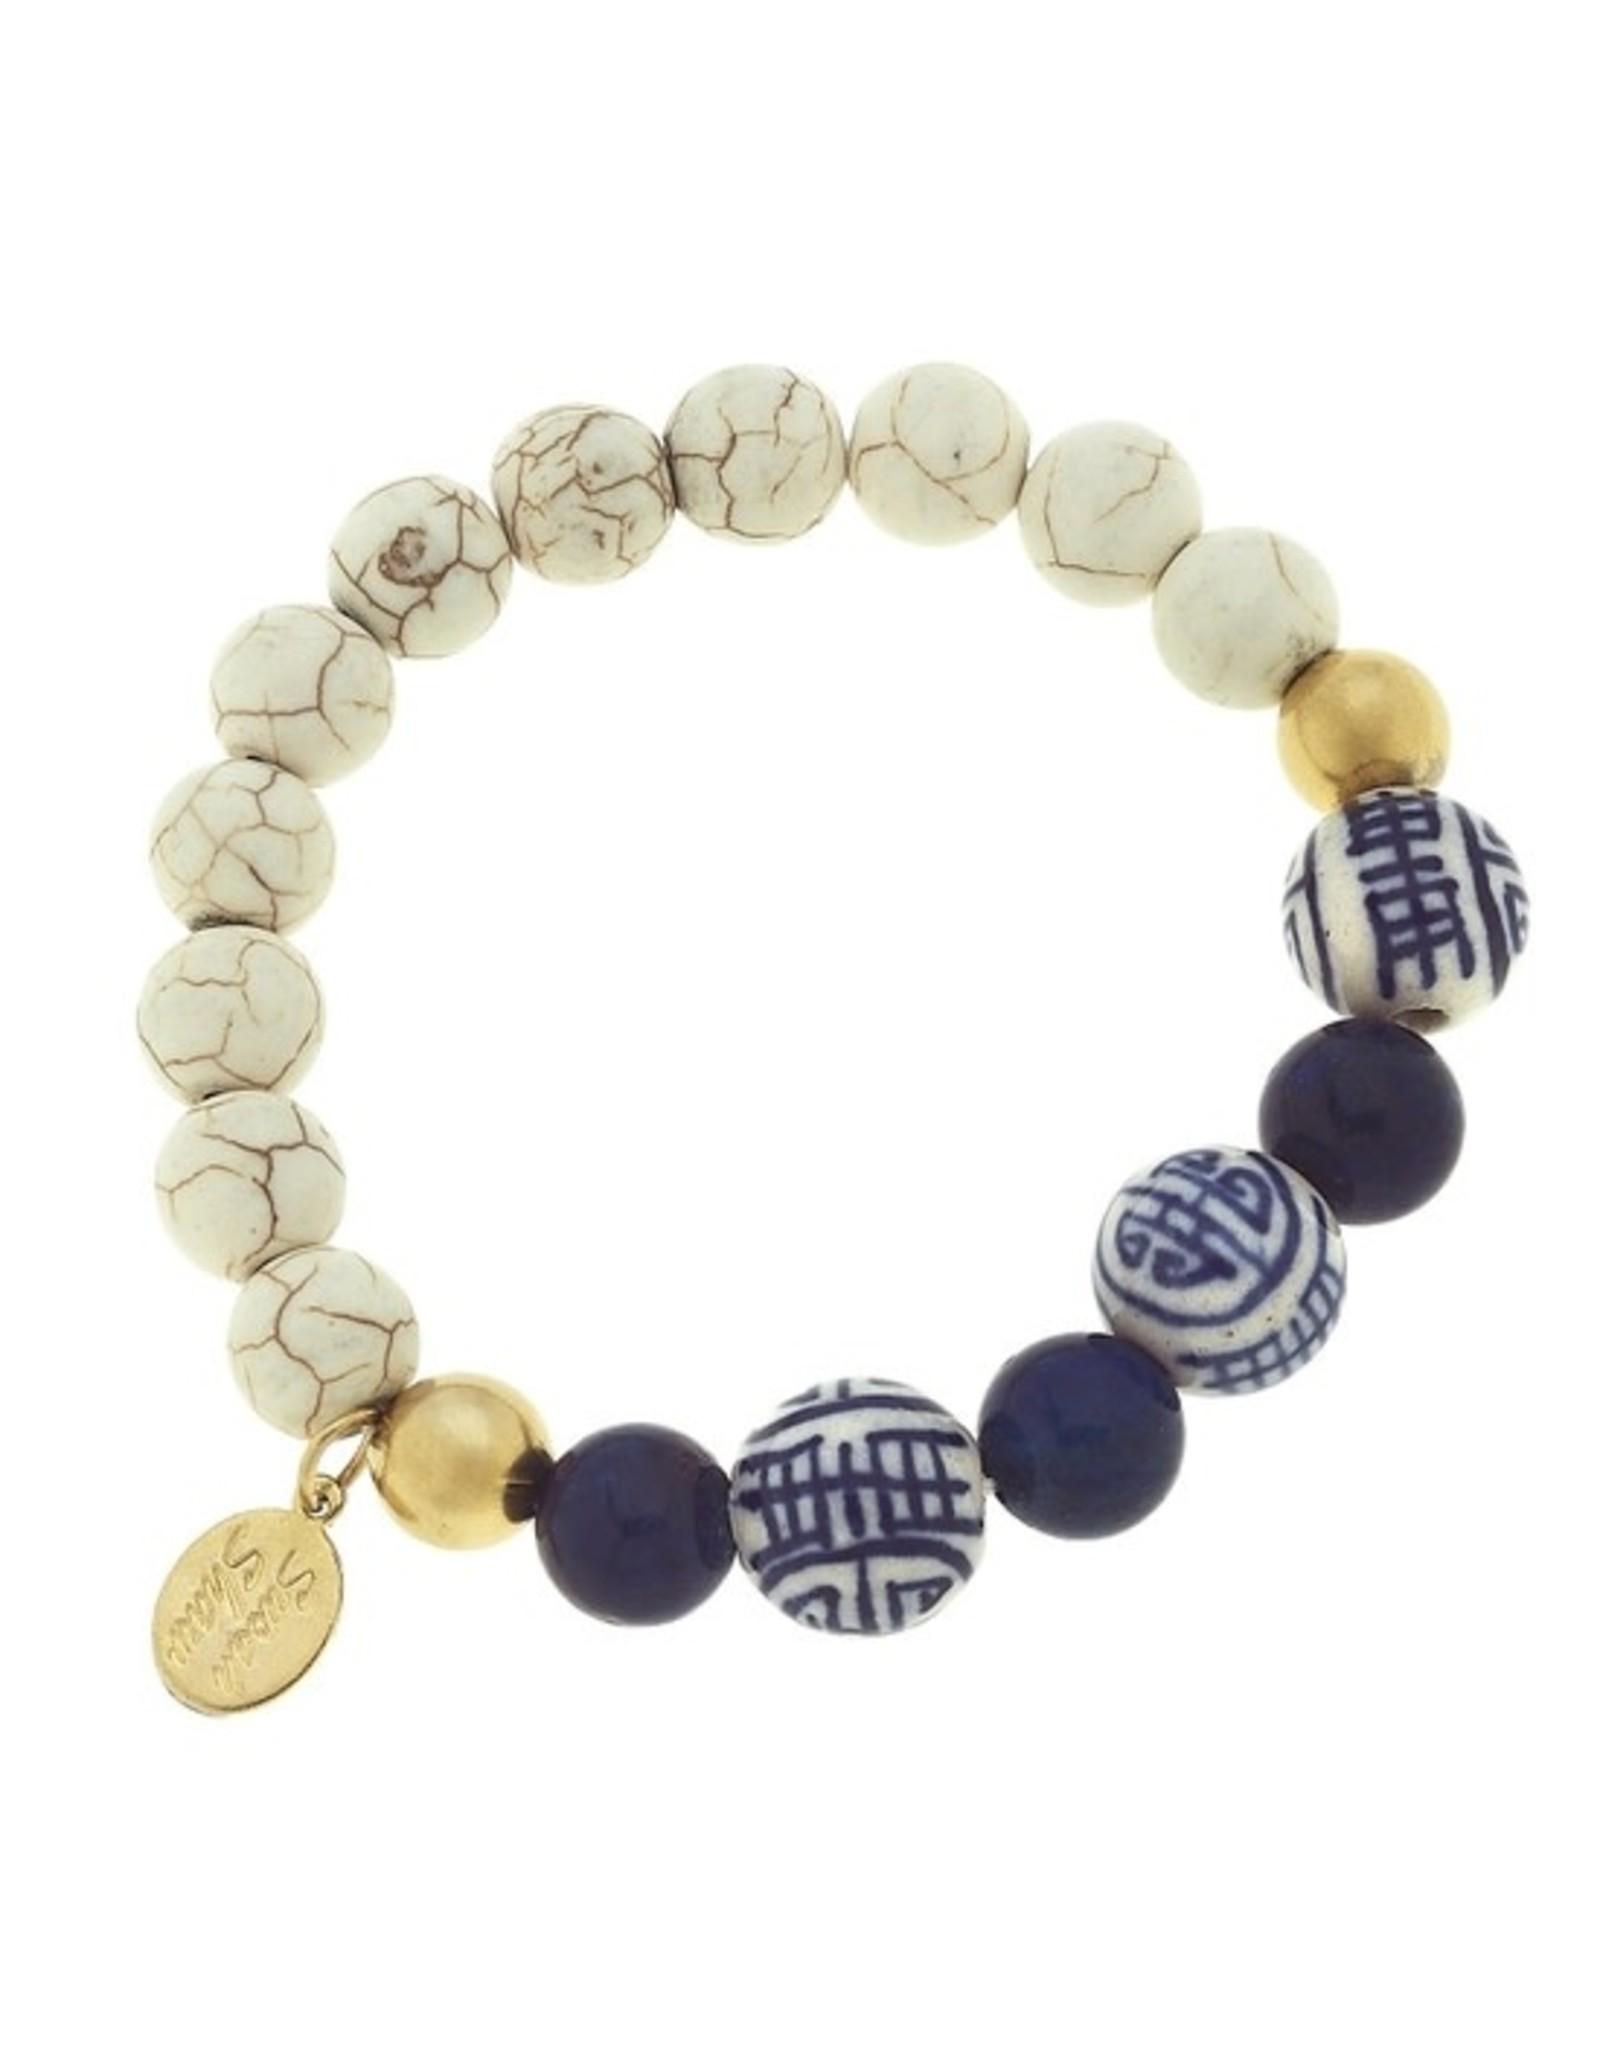 Susan Shaw White Turquoise, Lapis & Porcelain Stretch Bracelet by Susan Shaw